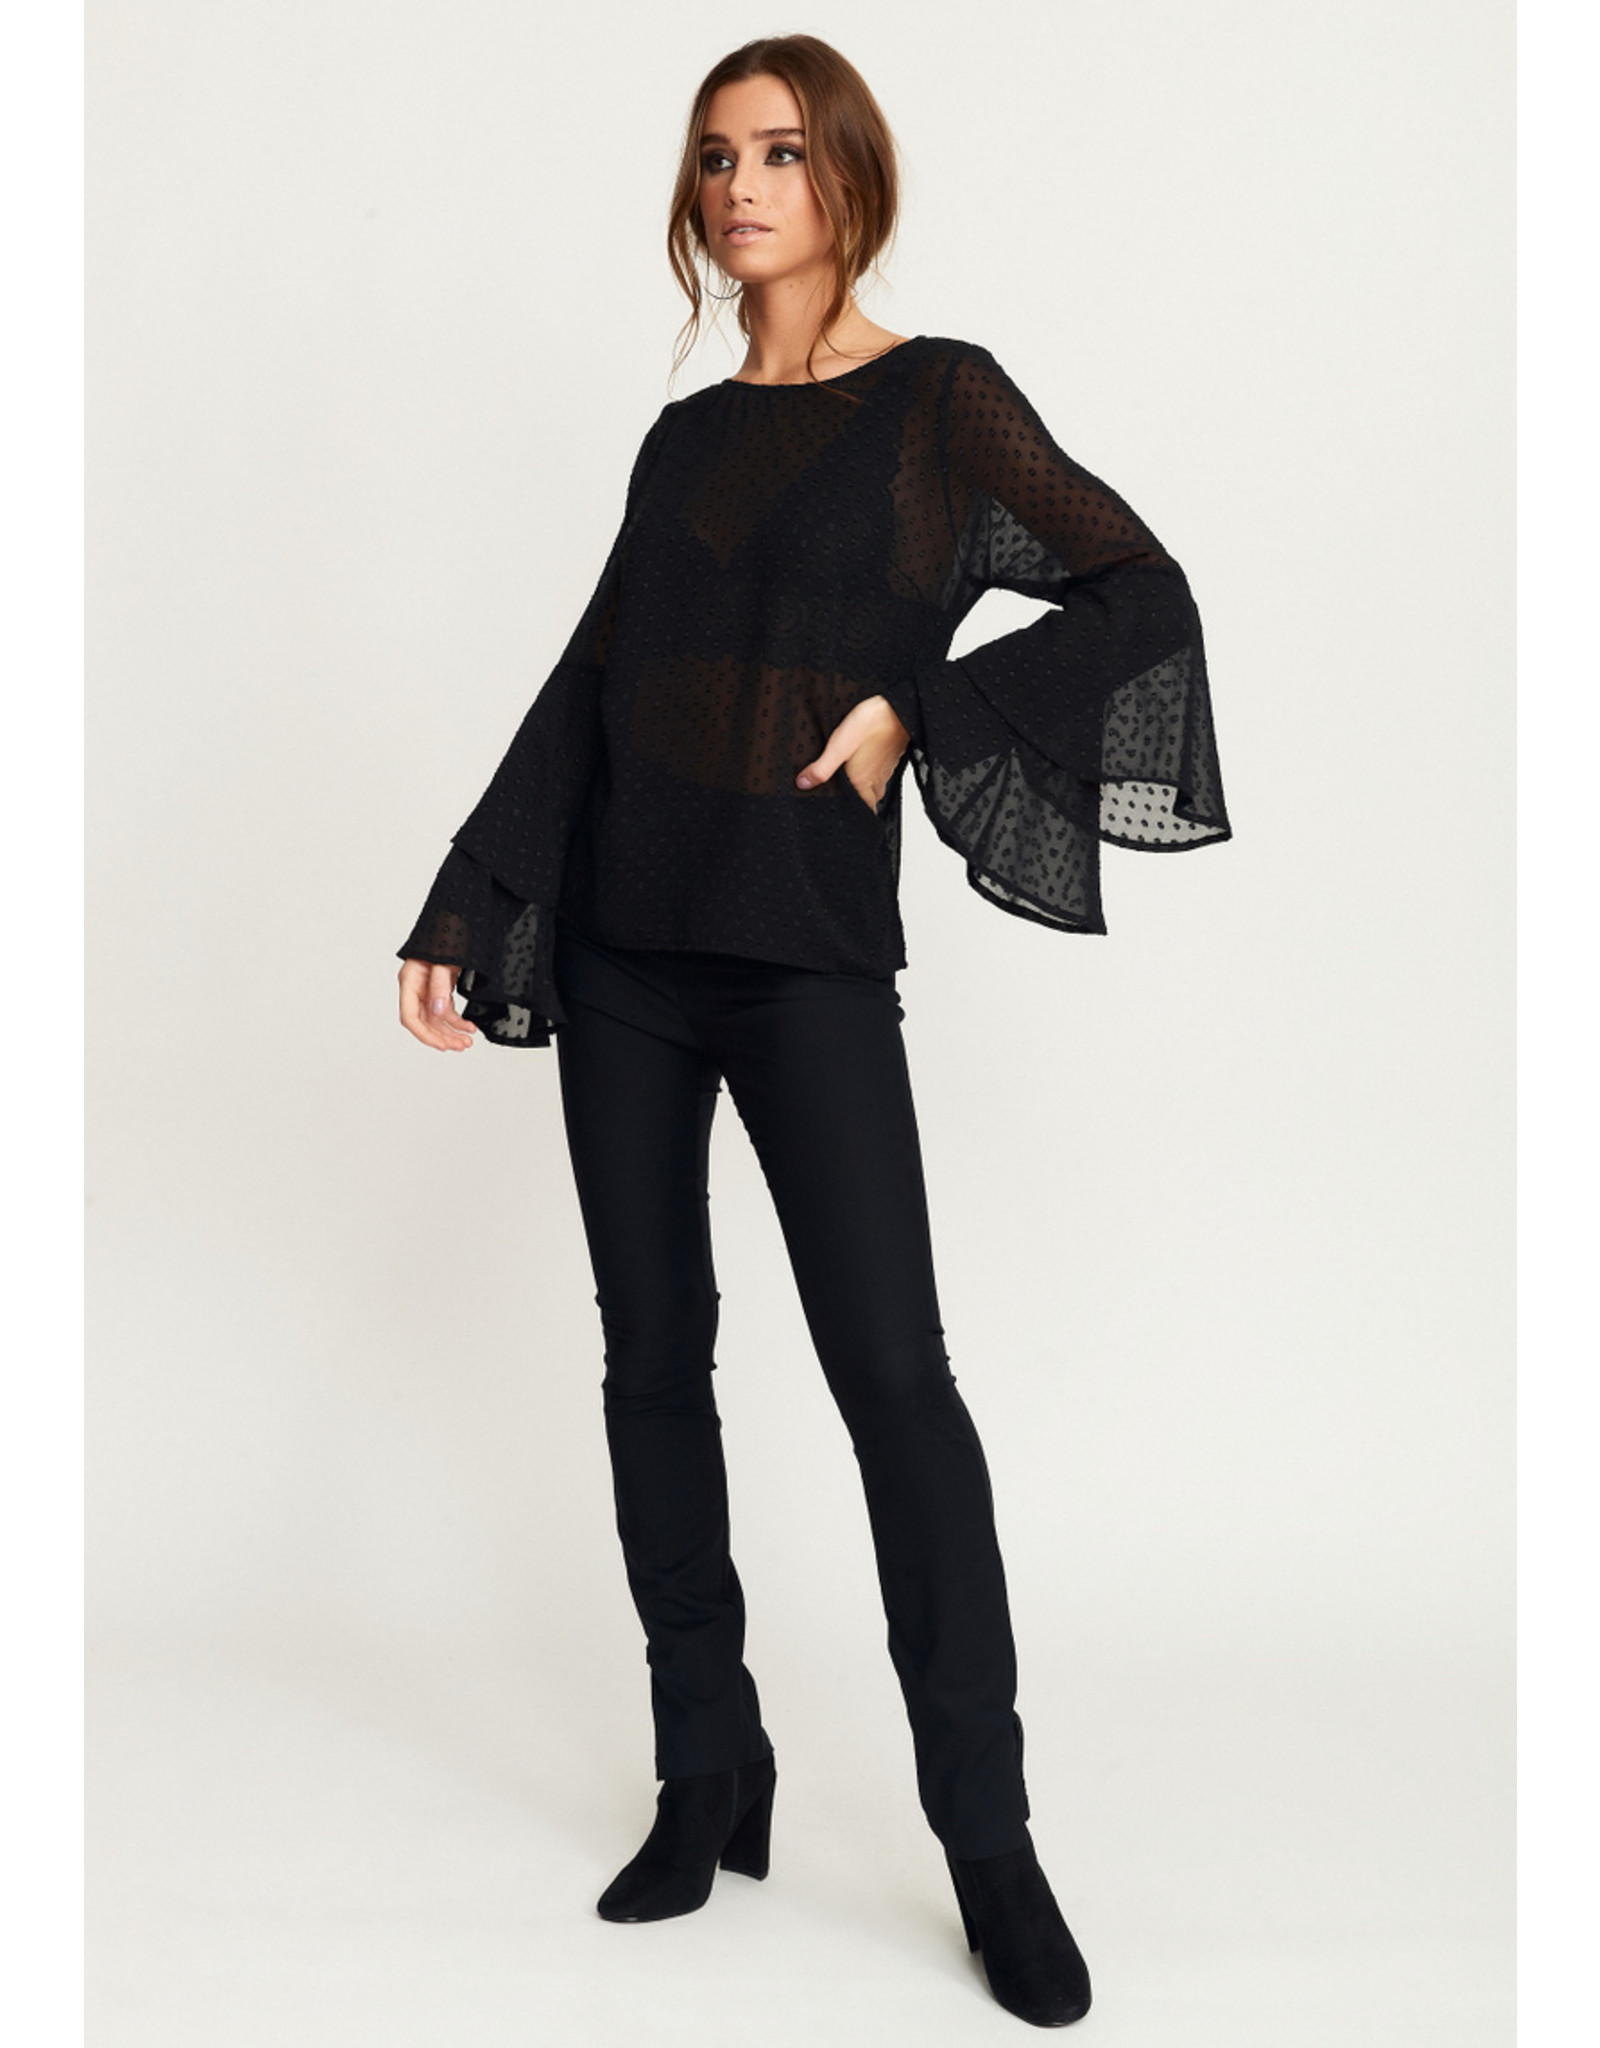 Rut & Circle Felicia Frill Sleeve Top Black